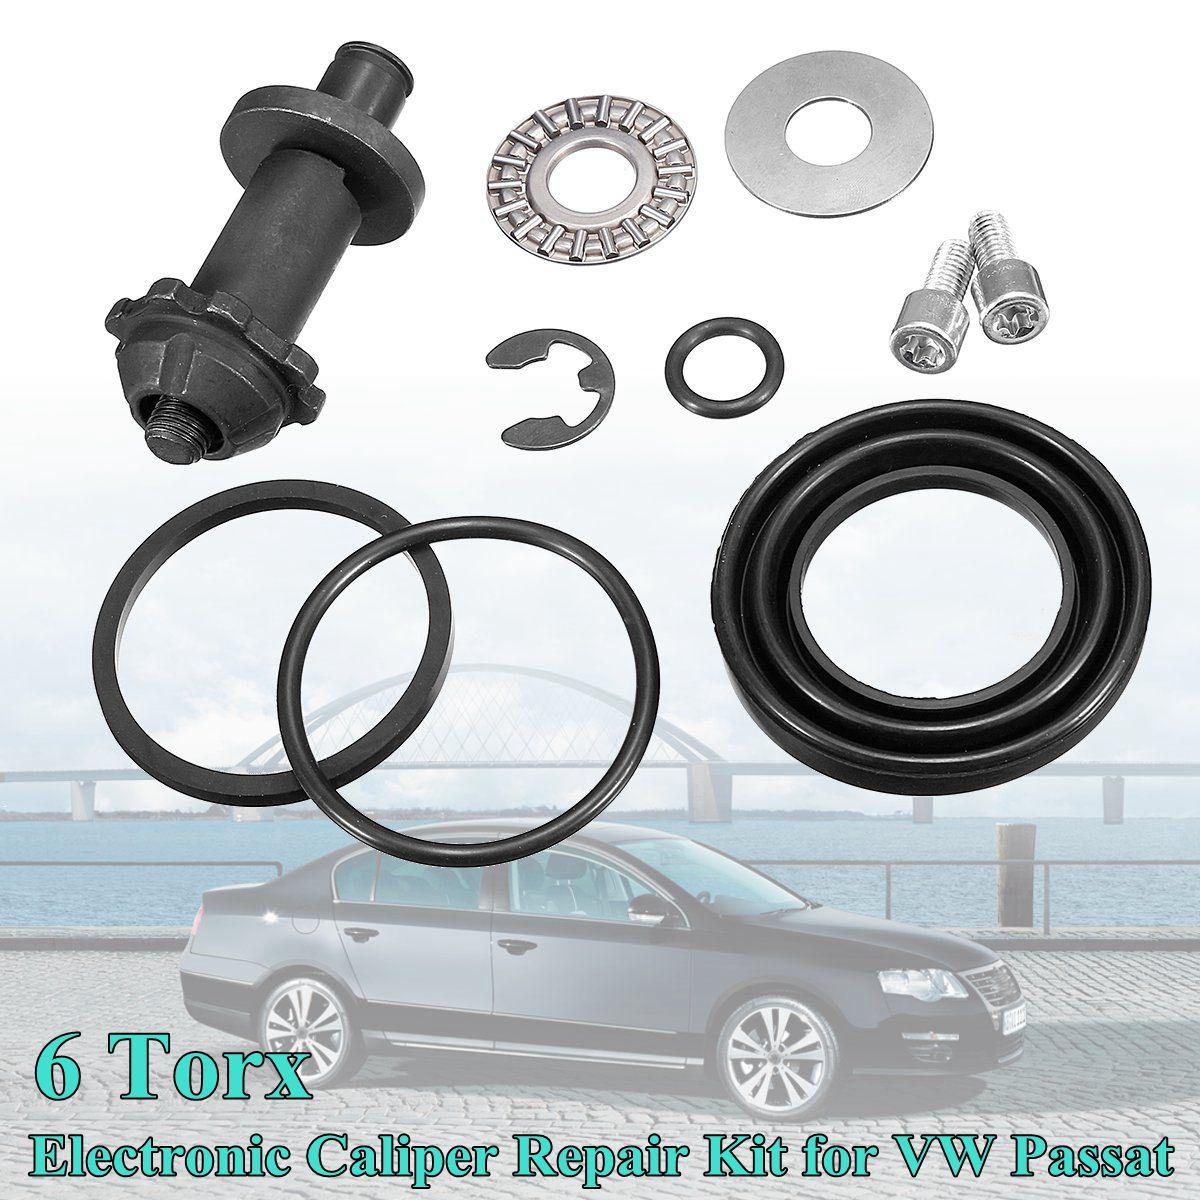 VW Polo 1985-2001 2x Front caliper guide slider pin kits bolt S7024BA-2 Optn 1